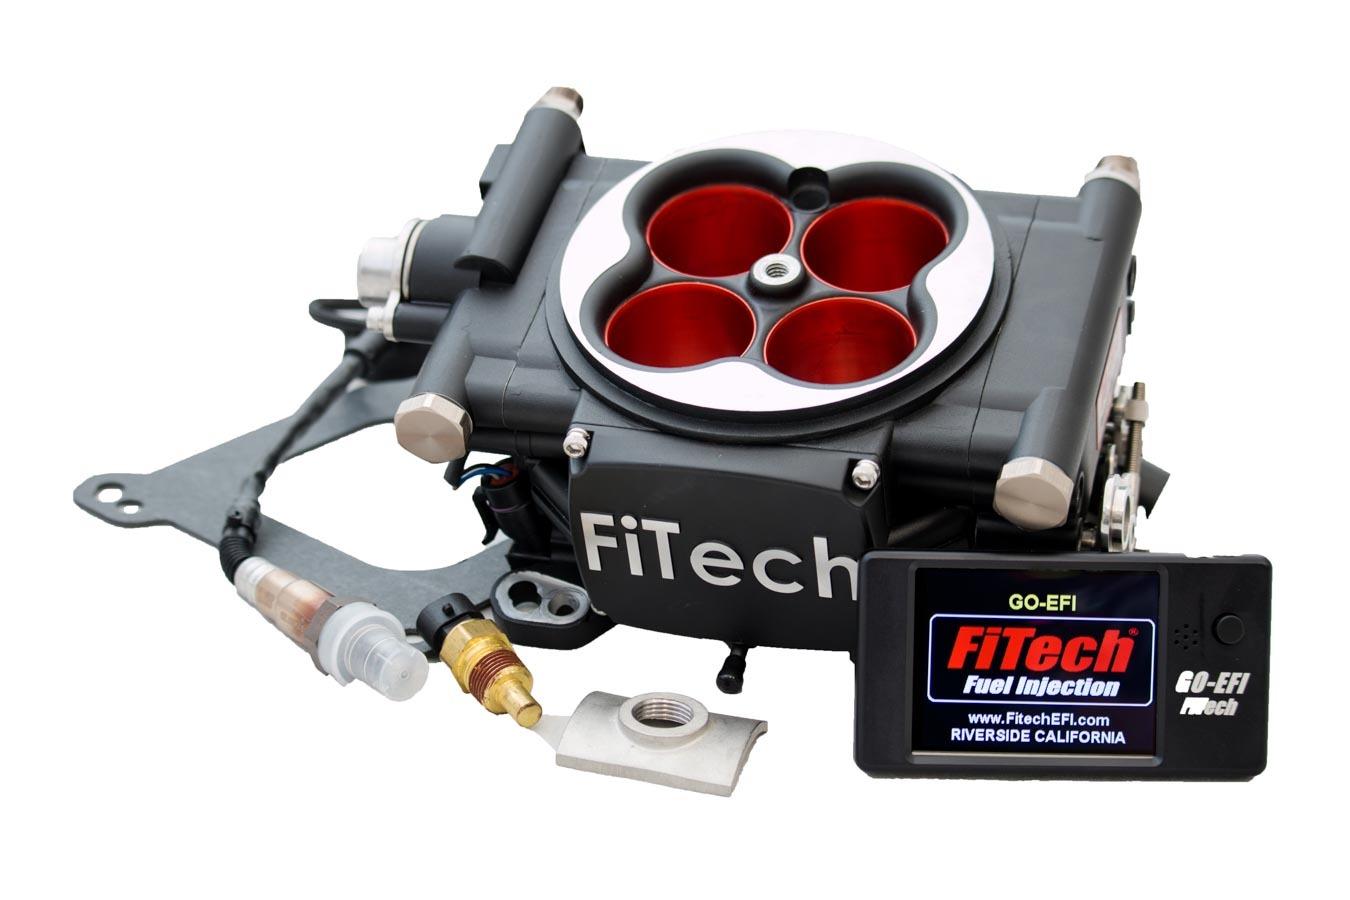 Fitech Fuel Injection Go EFI Power Adder 600hp Kit Matte Black